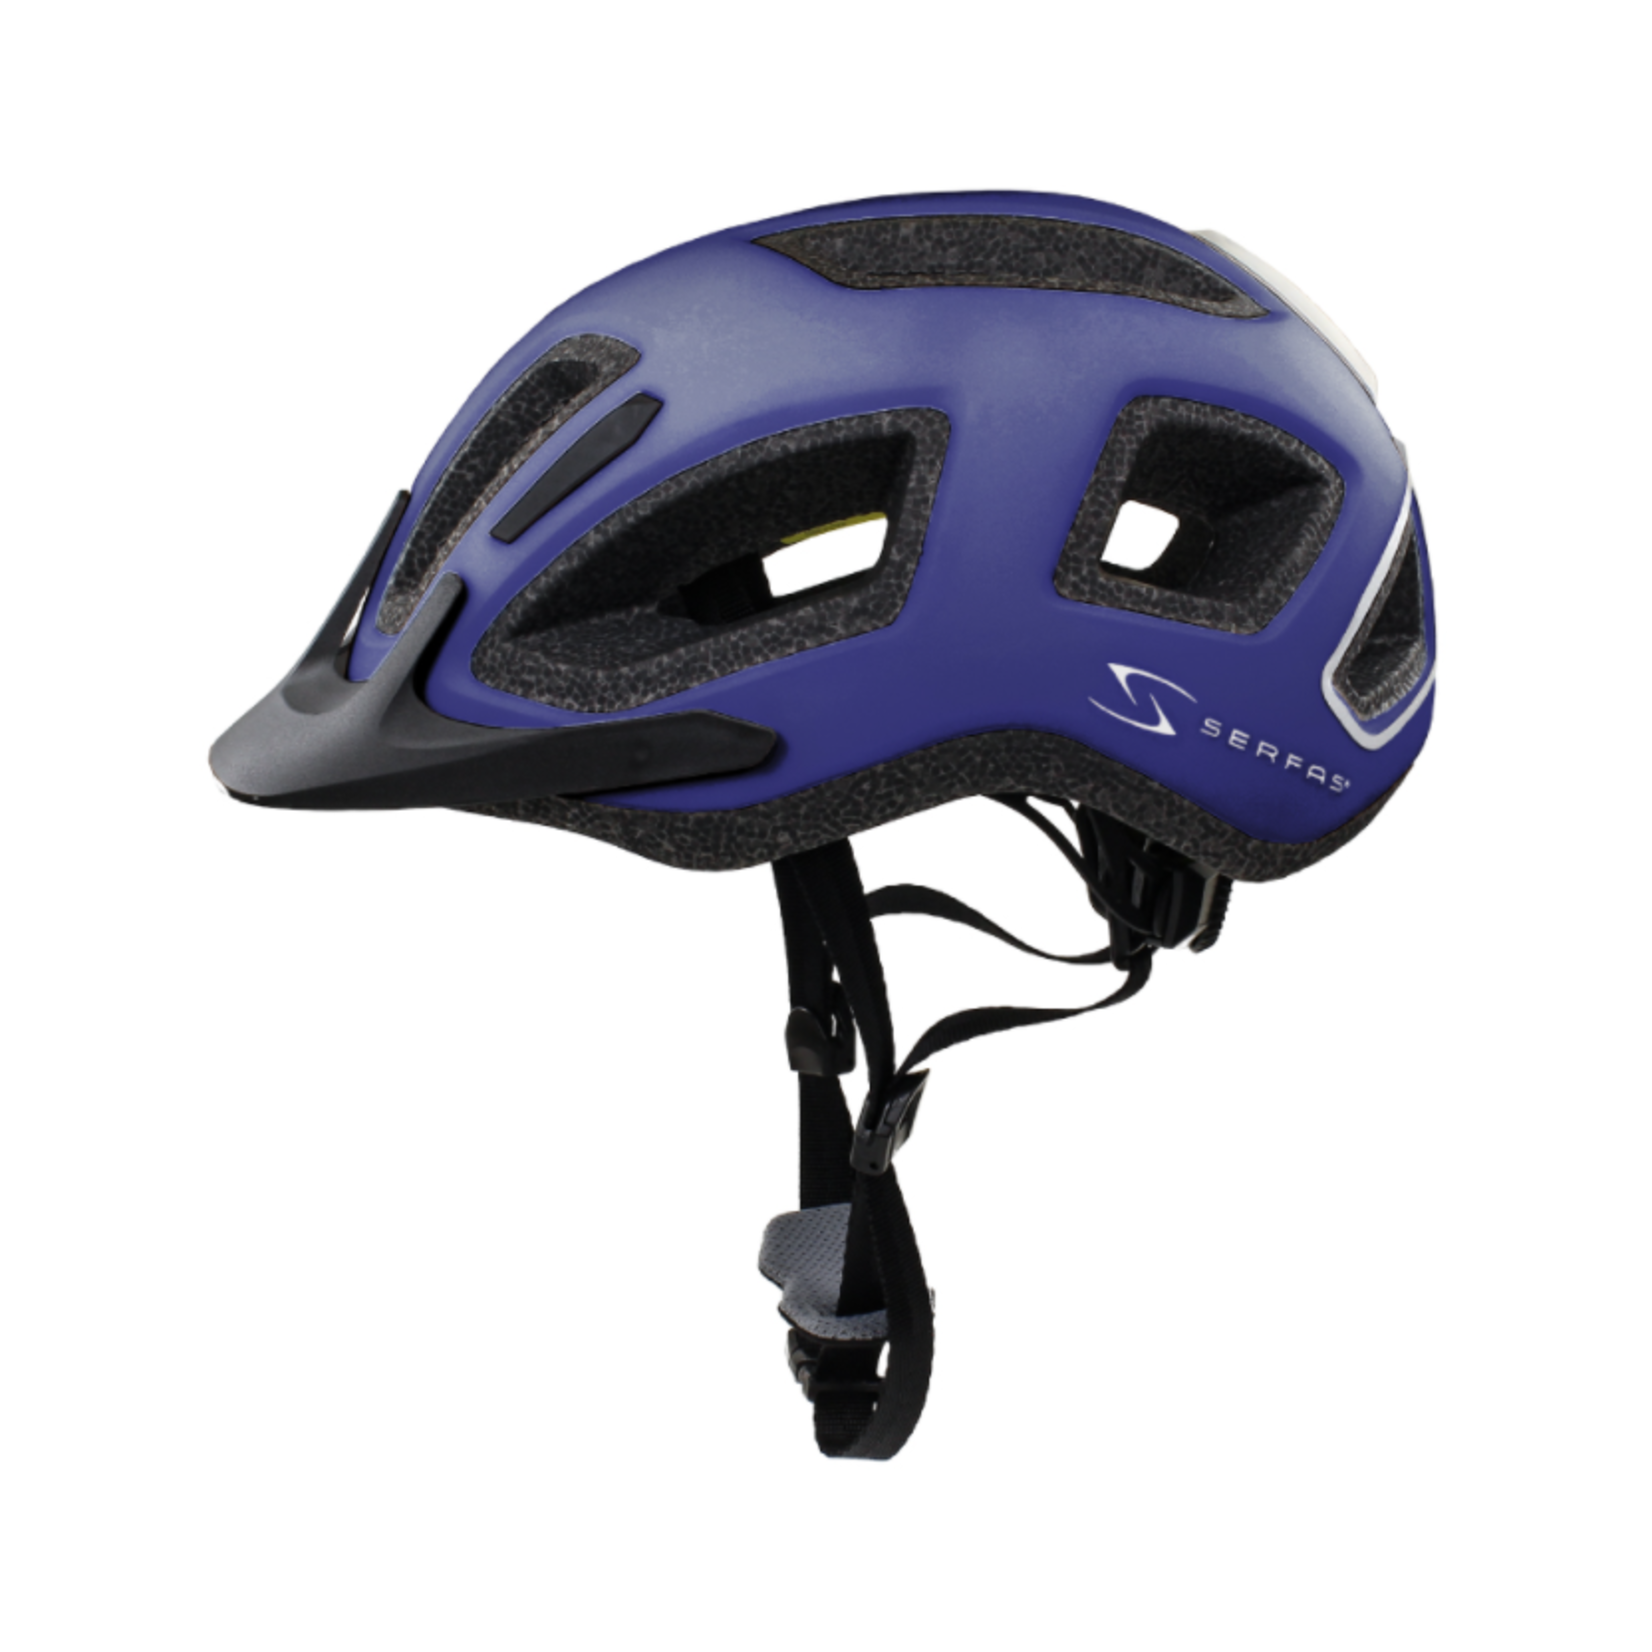 SERFAS Helmet HT-400BLBK Metro Matte Blue SM/MD